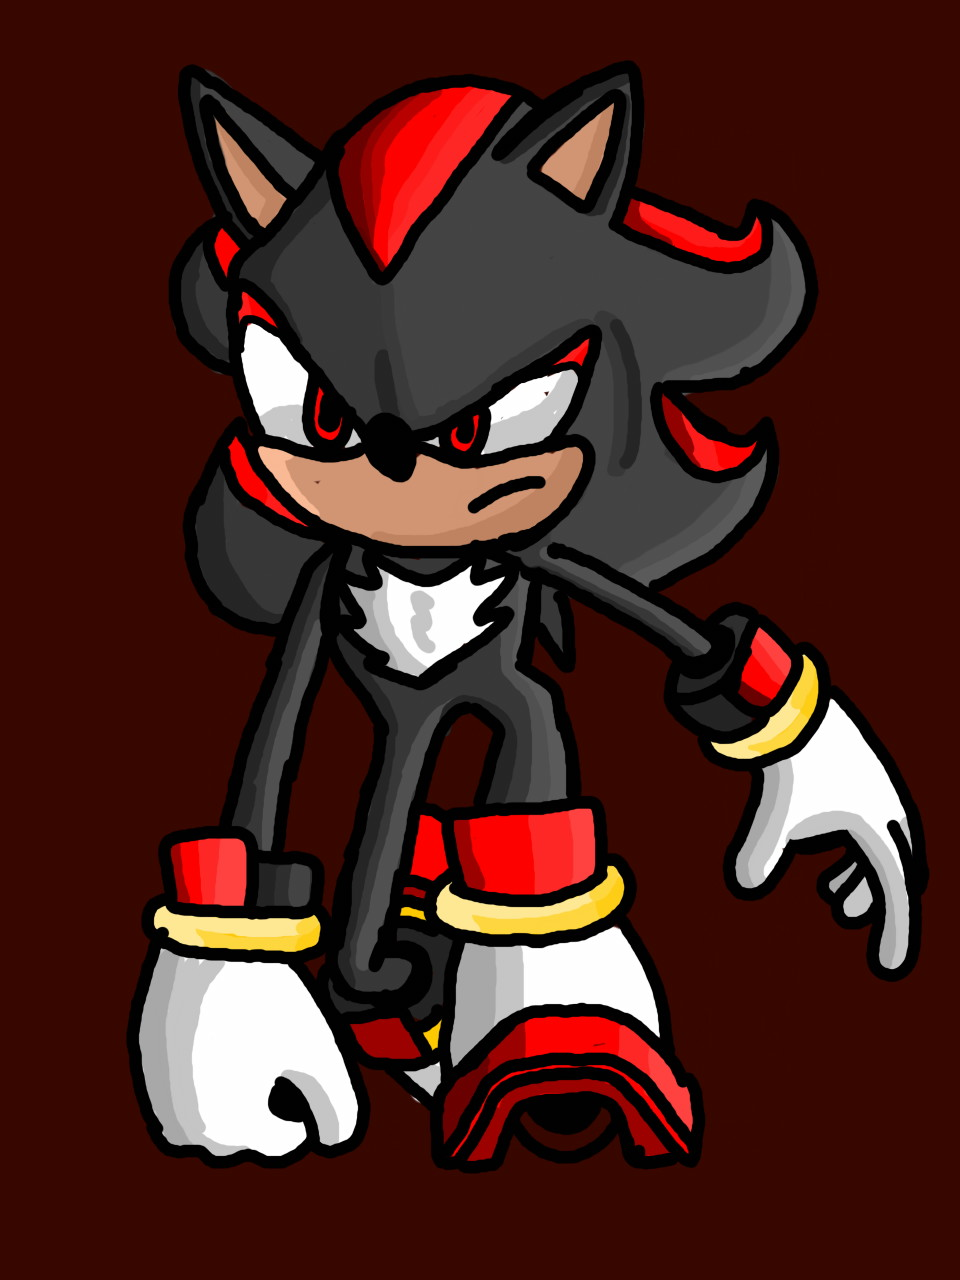 Shadow the Hedgehog 3